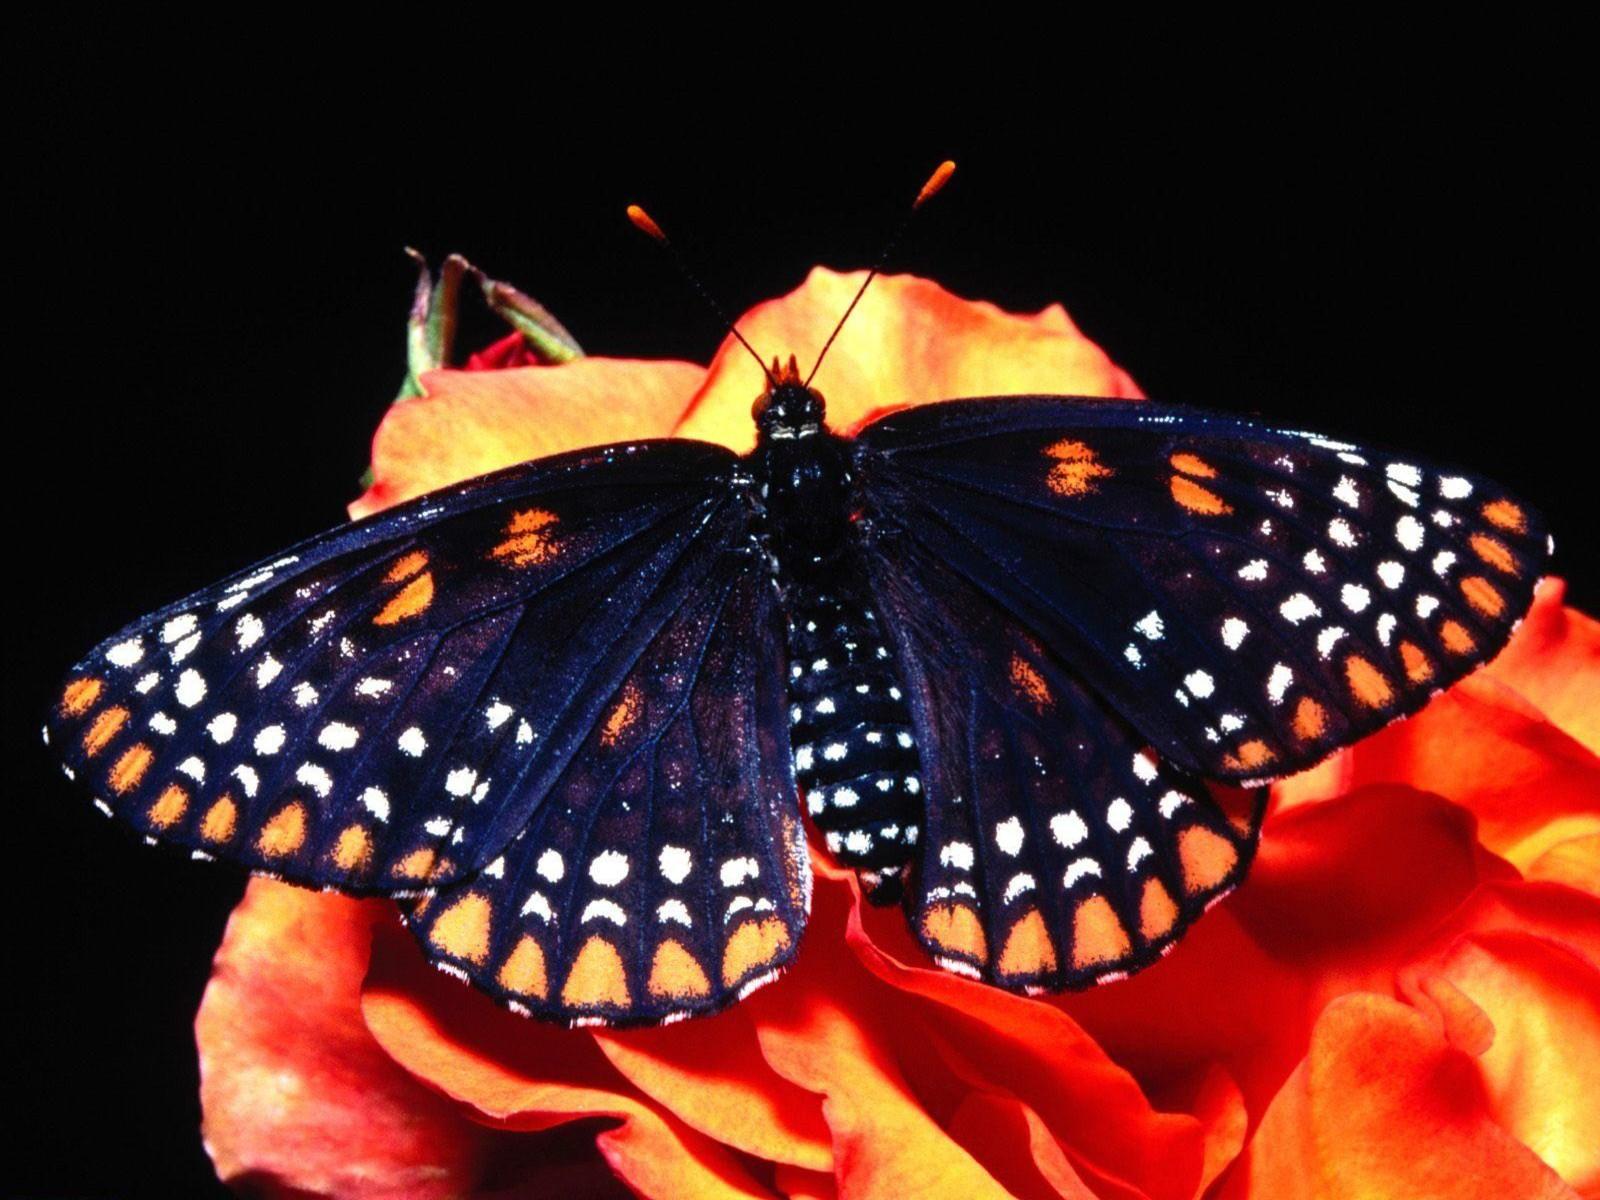 http://1.bp.blogspot.com/-aiippUTHLv0/TlvB2s8bSBI/AAAAAAAAAsA/GLdIGGe1pwg/s1600/butterfly-020.jpg